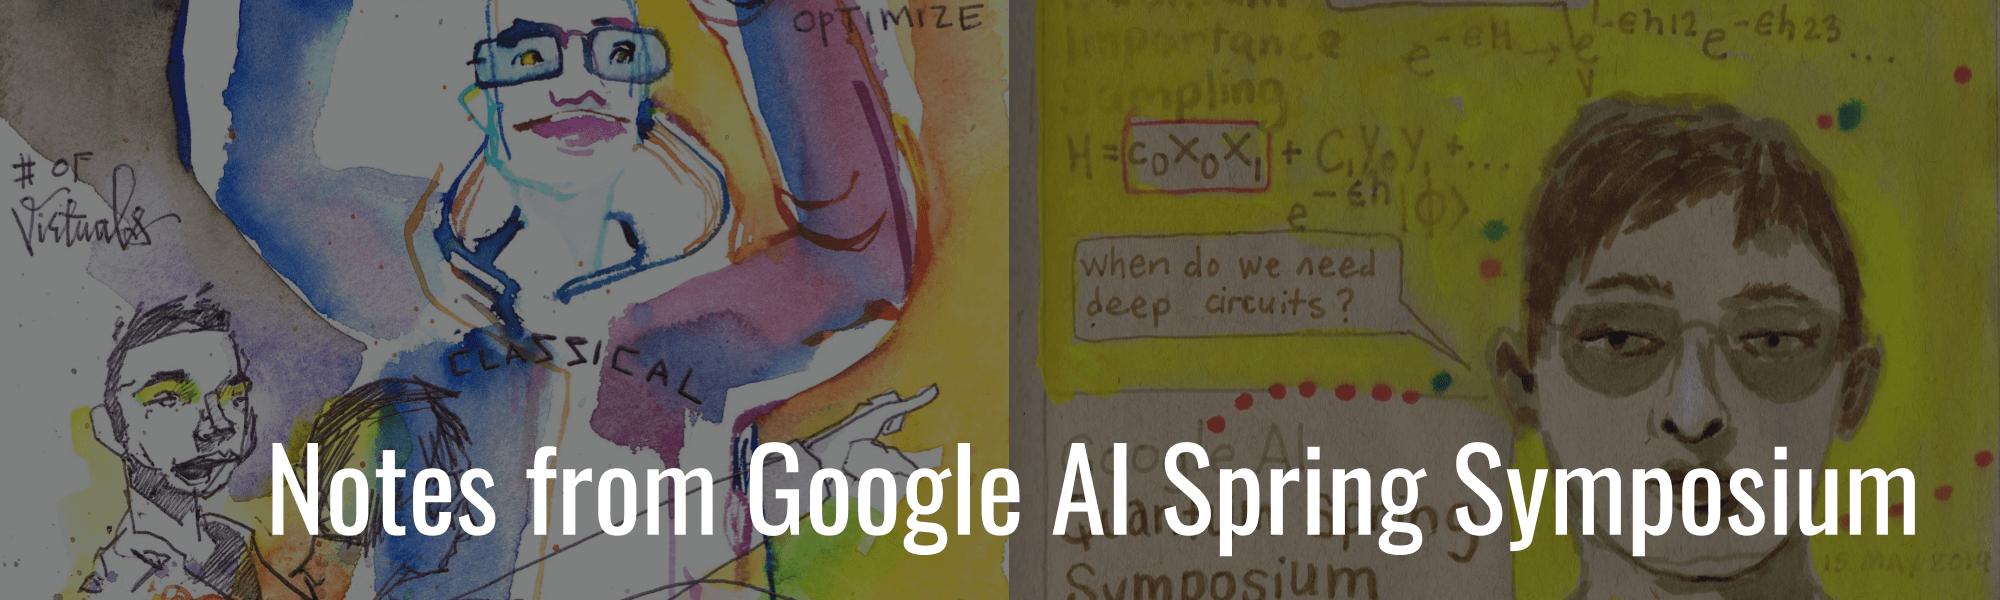 notes-from-google-ai-spring-symposium-illuminated-notes-case-study-late-nite-art